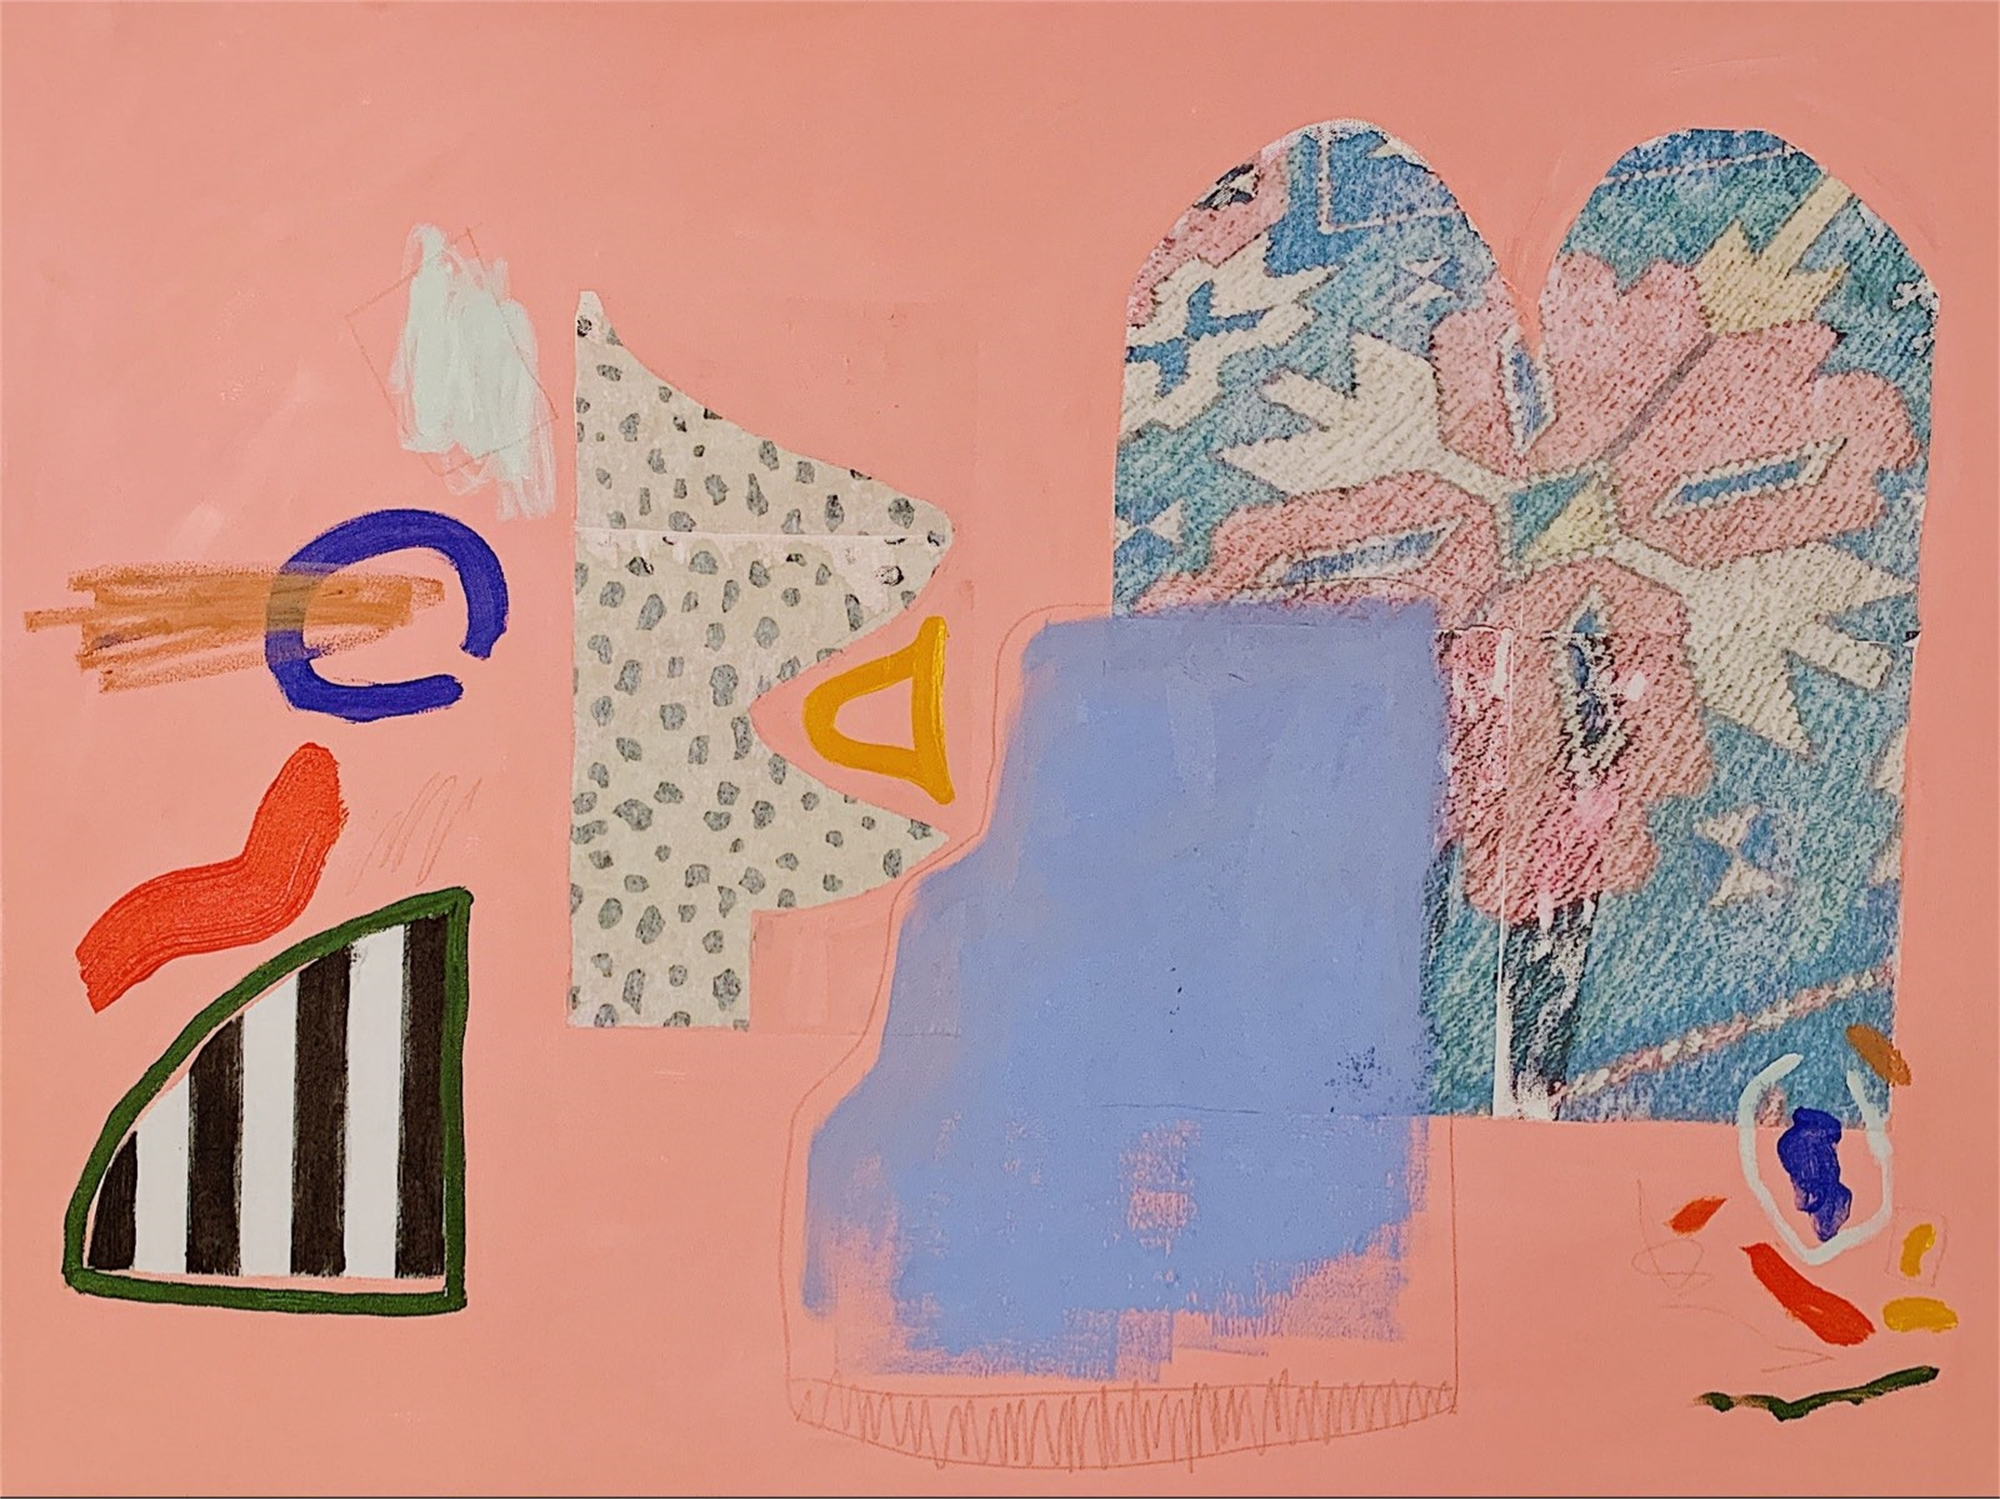 Elation / Elevation by Kathleen Jones